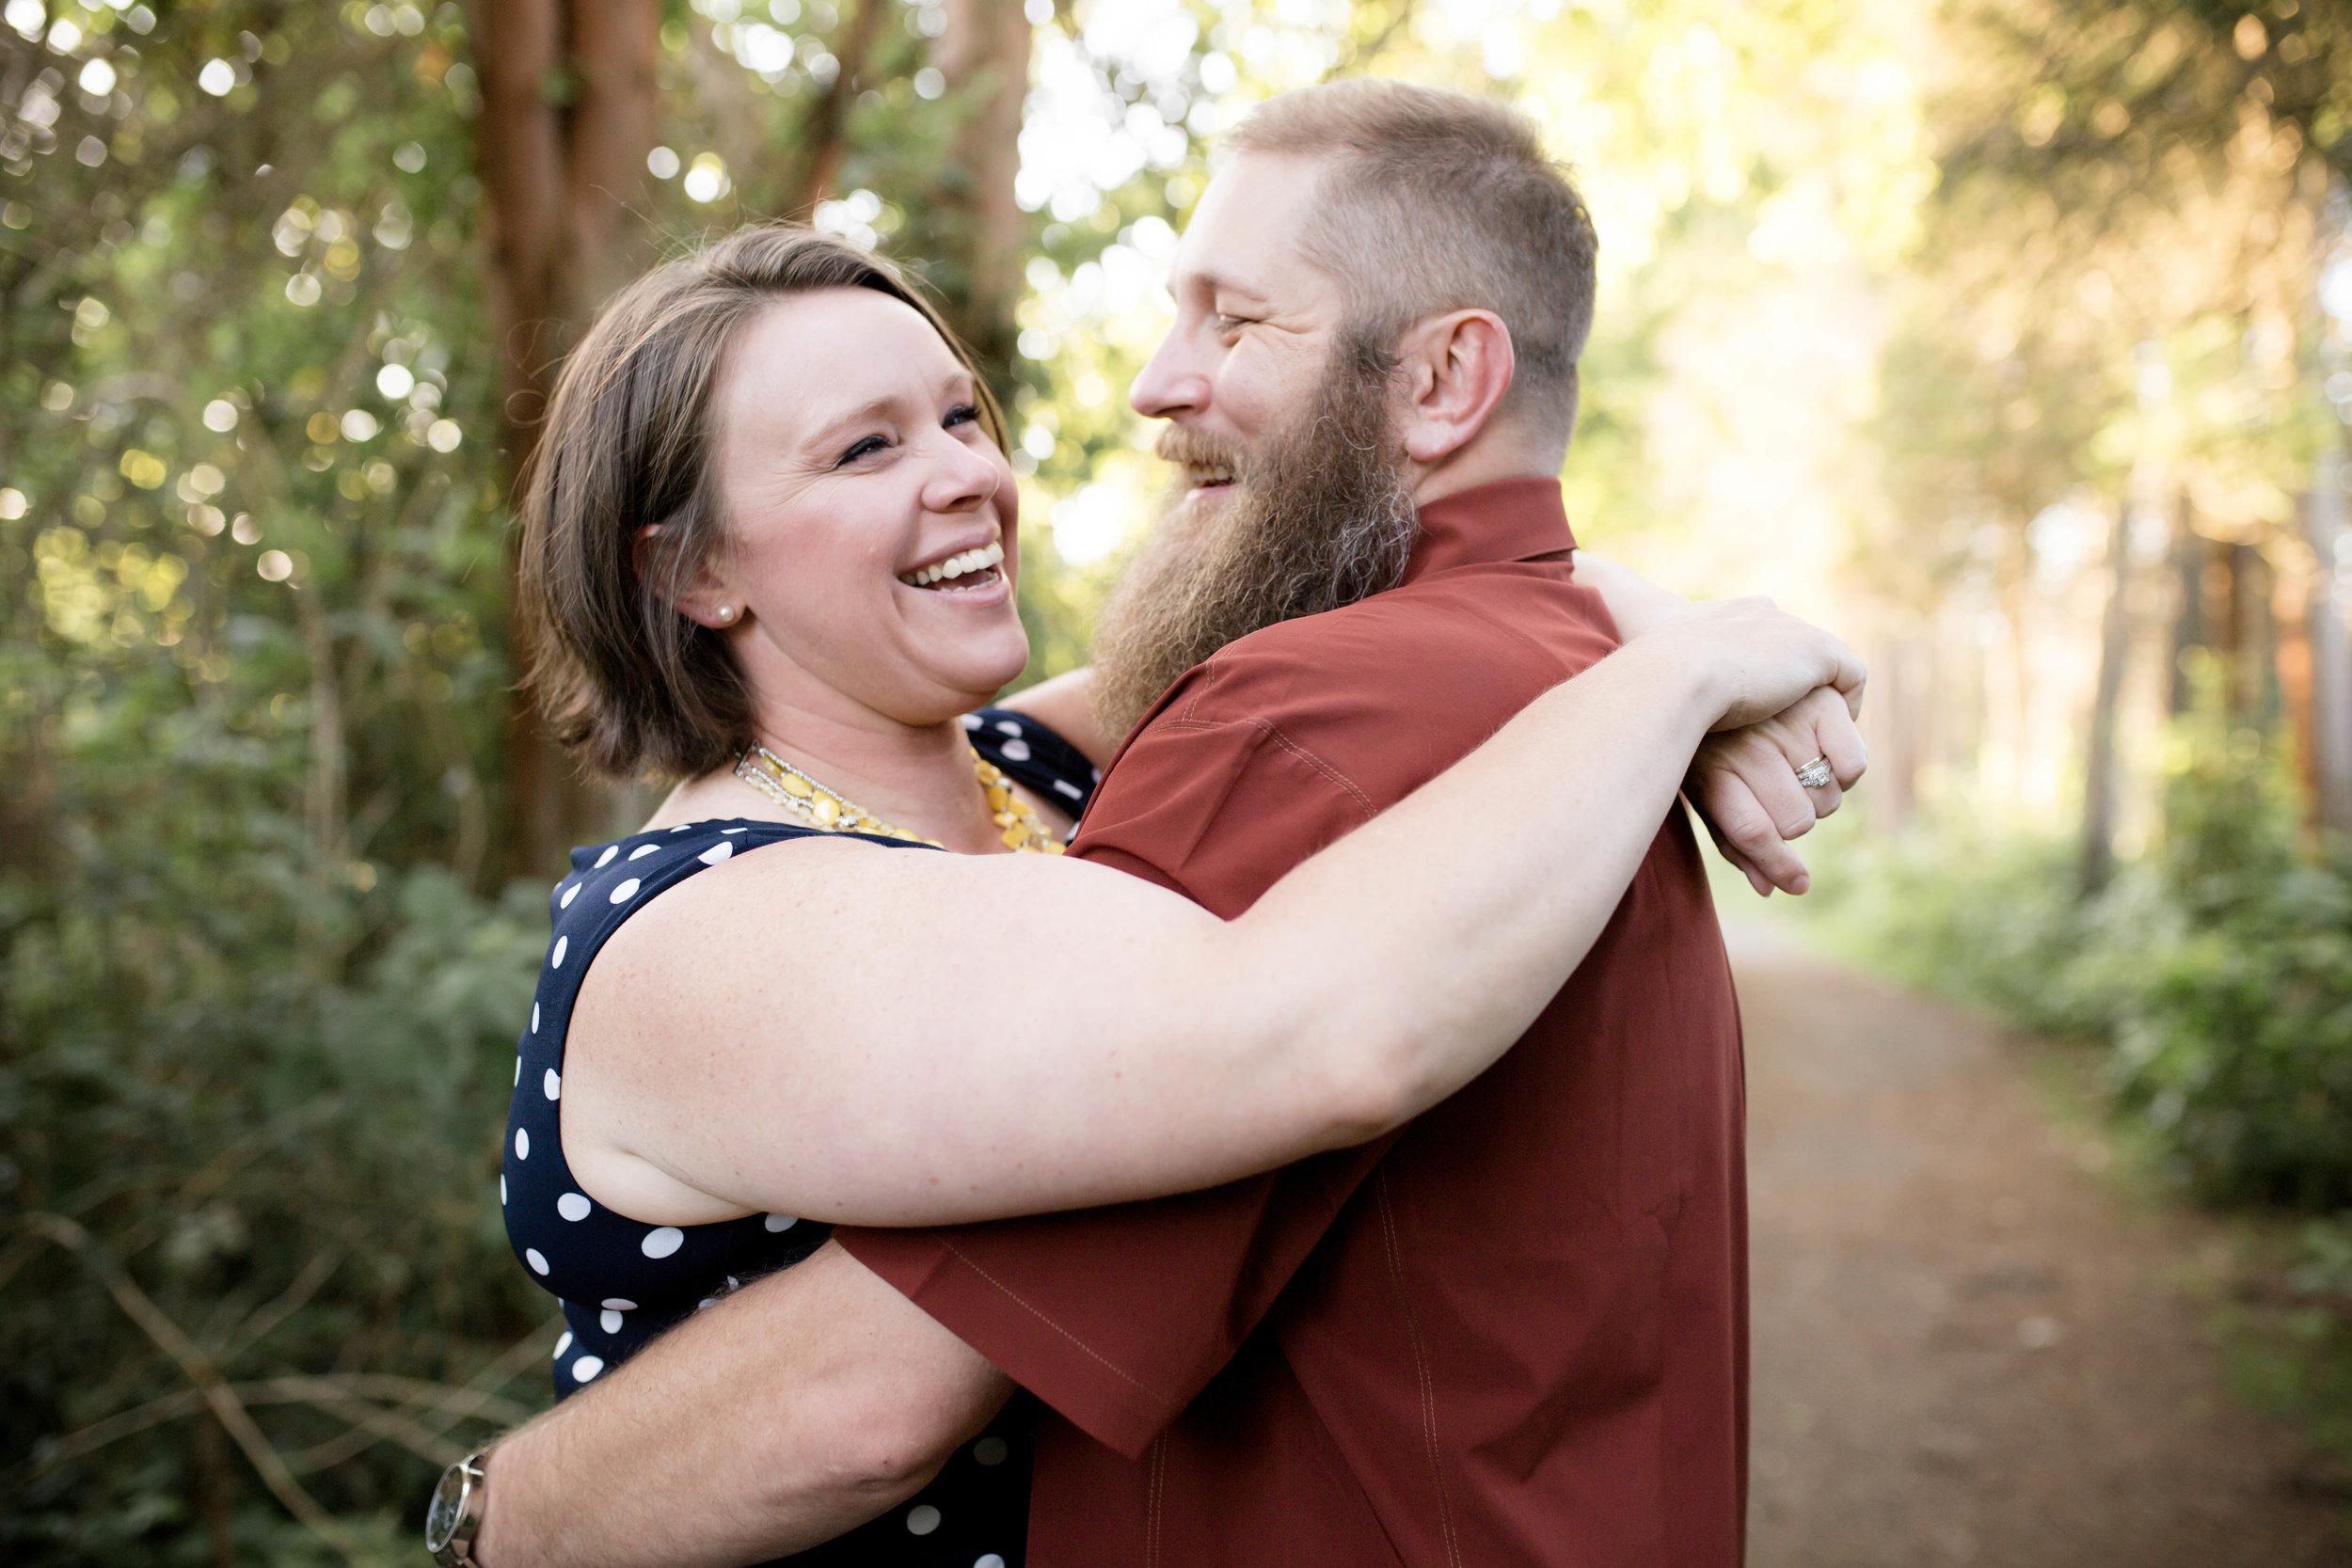 Ft. Steilacoom Couples Photography | Tacoma Engagement Photographer